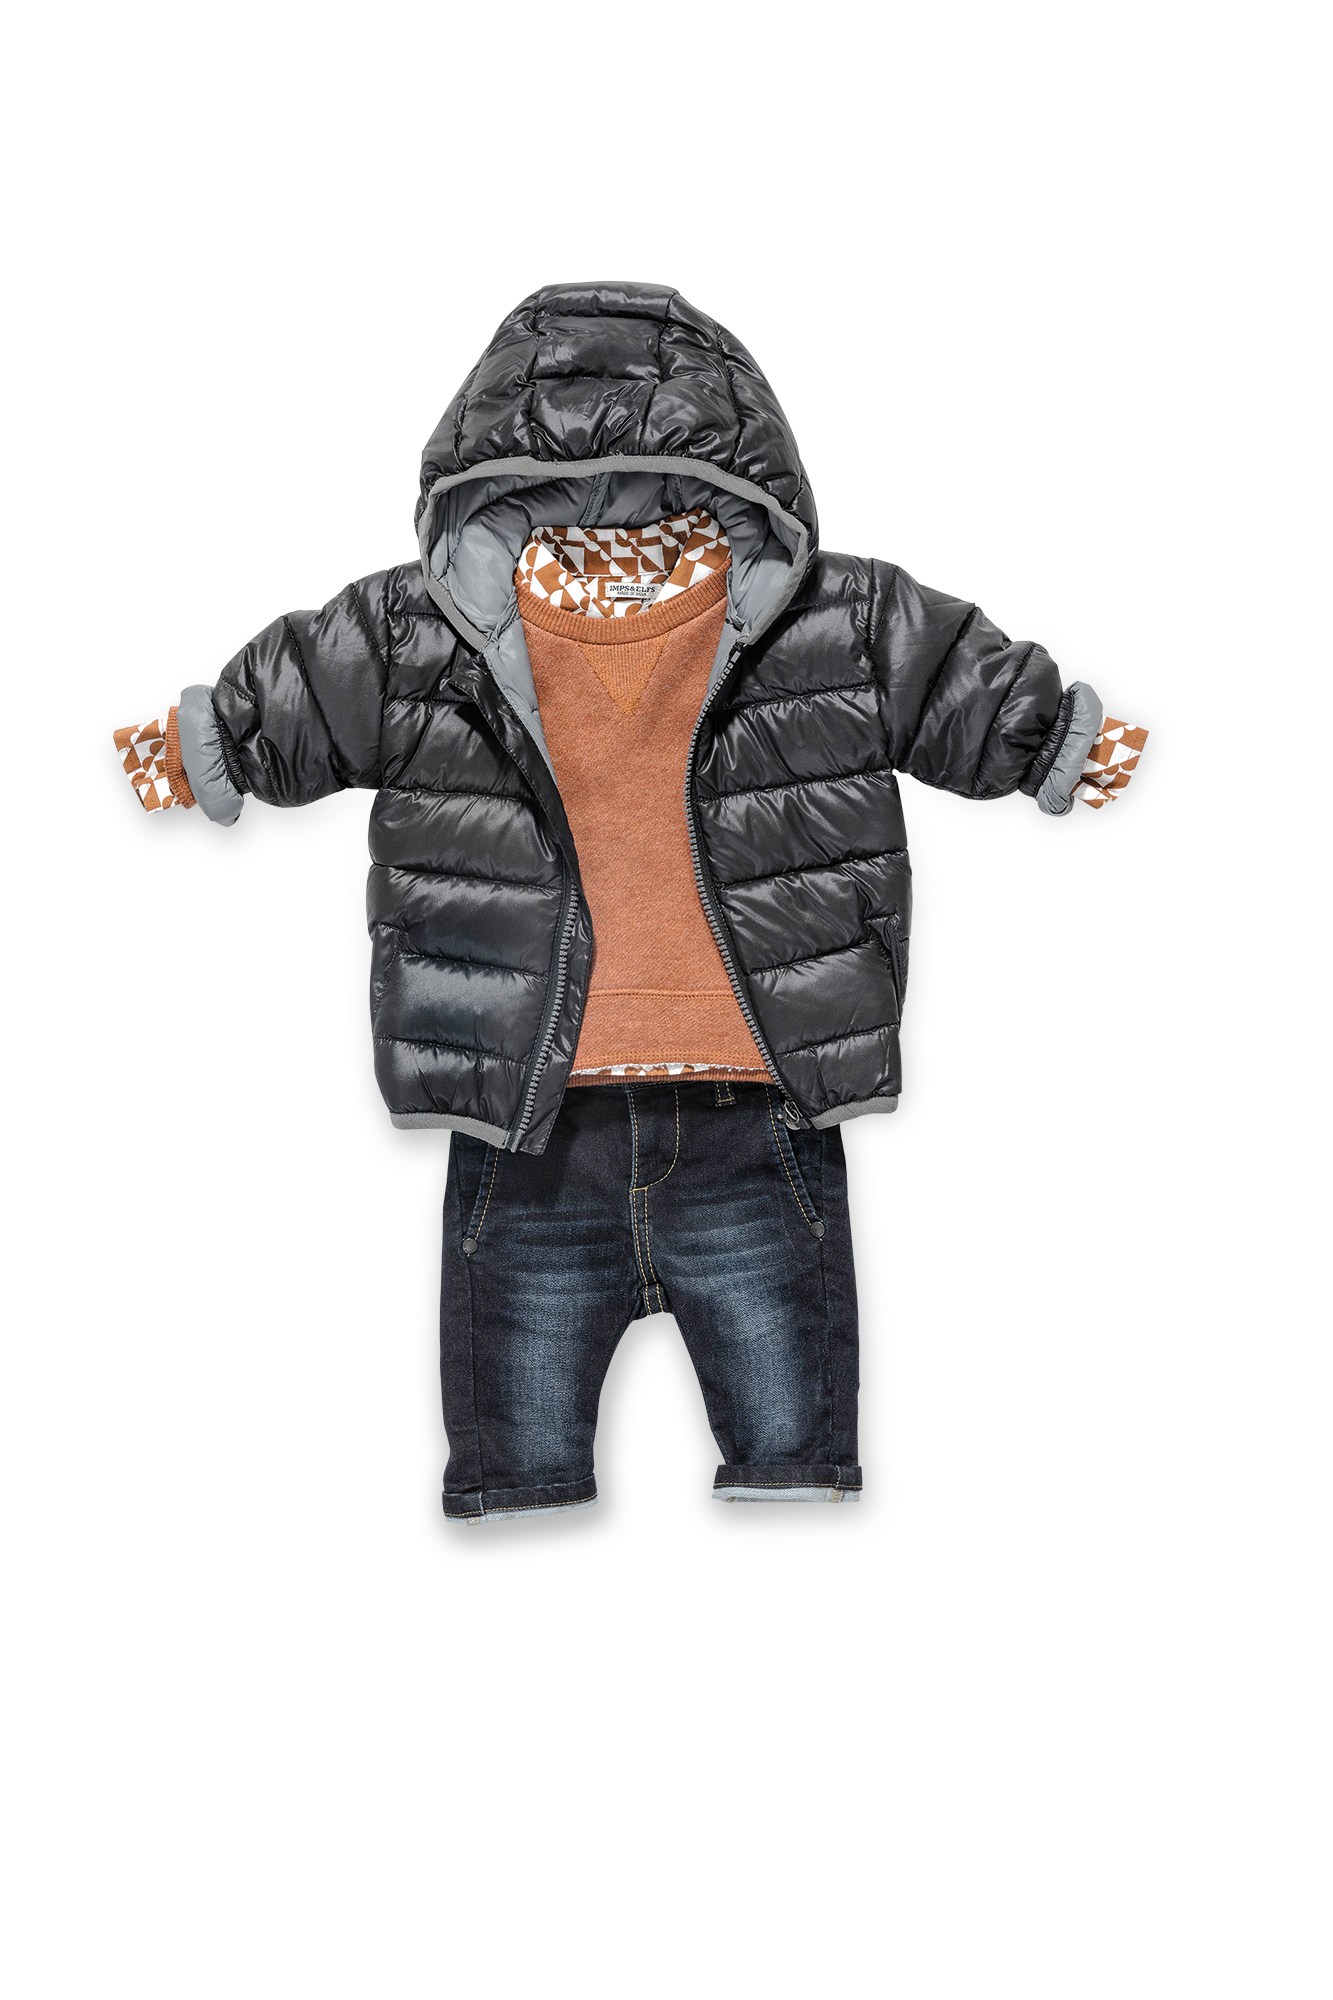 Imps & Elfs: Weltenbummler Hemd (ab 35,95 €), Pullover (ab 42,95 €) Chino (ab 49,95 €), Jacke (ab 79,95 €) www.imps-elfs.com